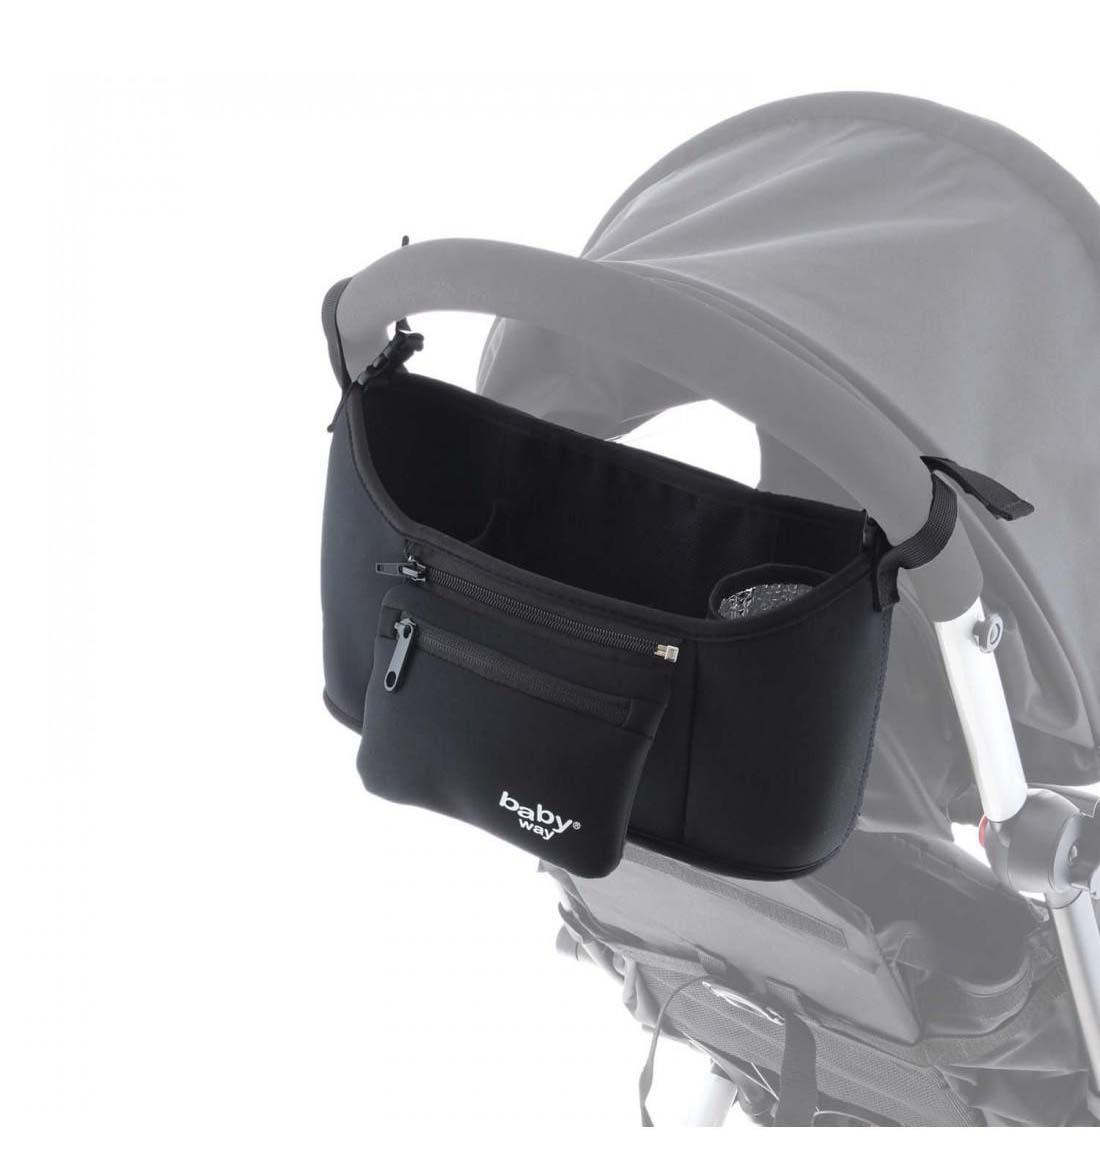 Bolso Maternal Coche Baby Way Bw-Bag26 Negro